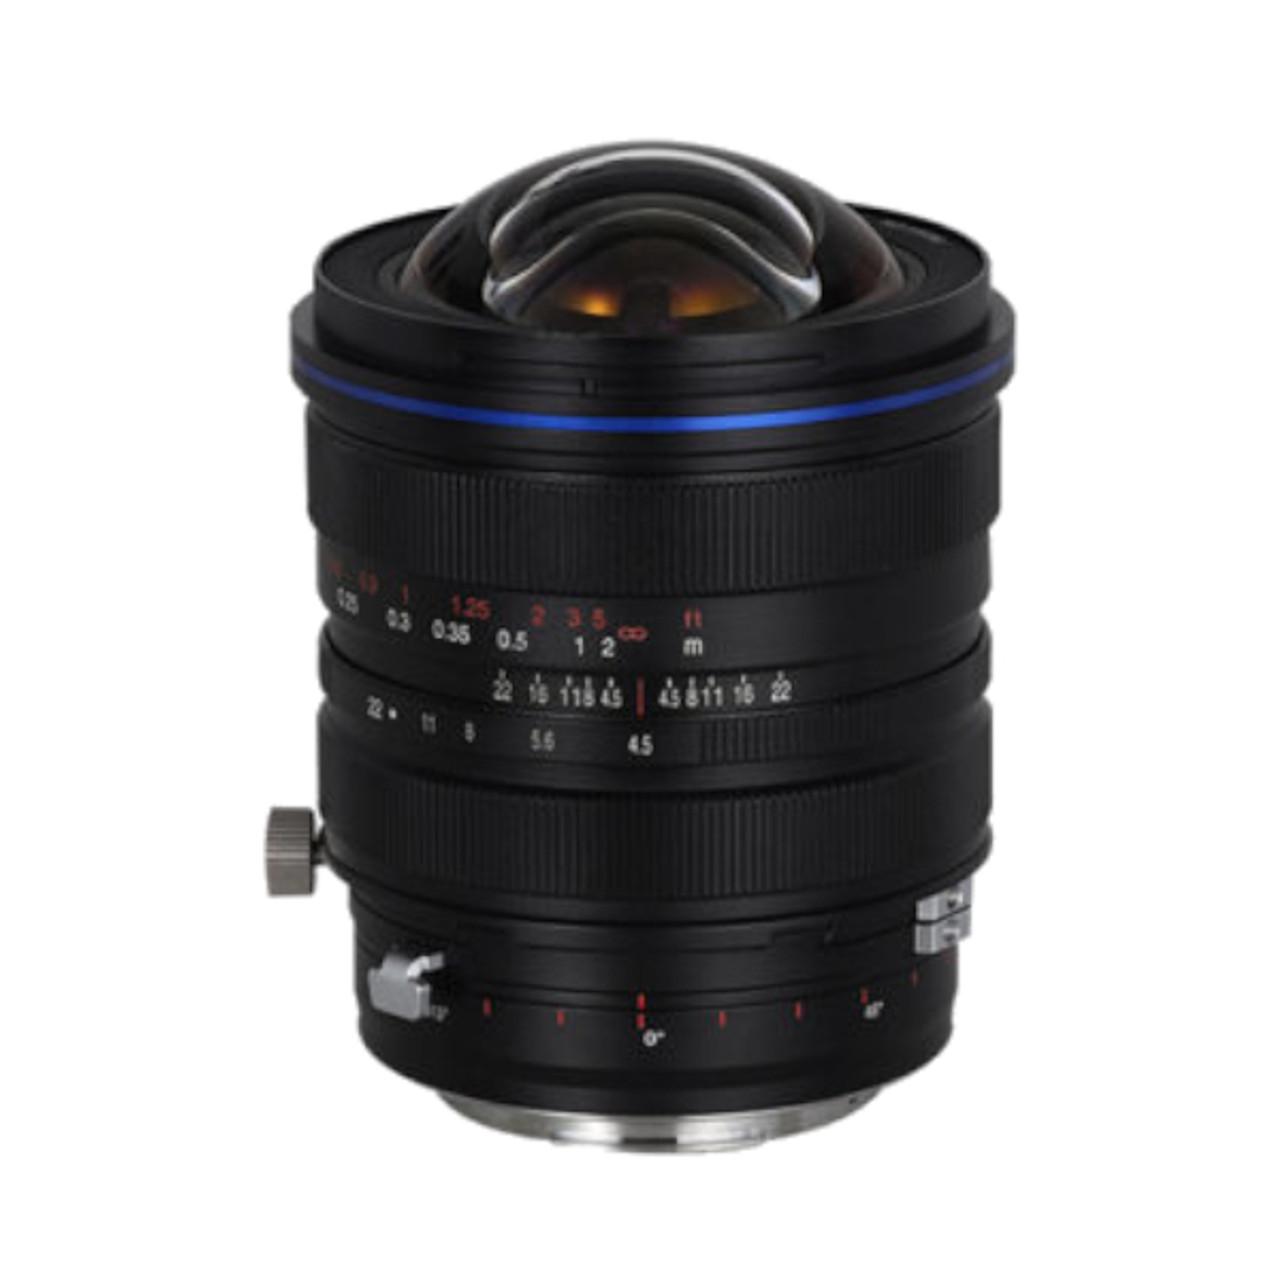 Laowa 15mm F4.5 Zero-D Shift Canon RF